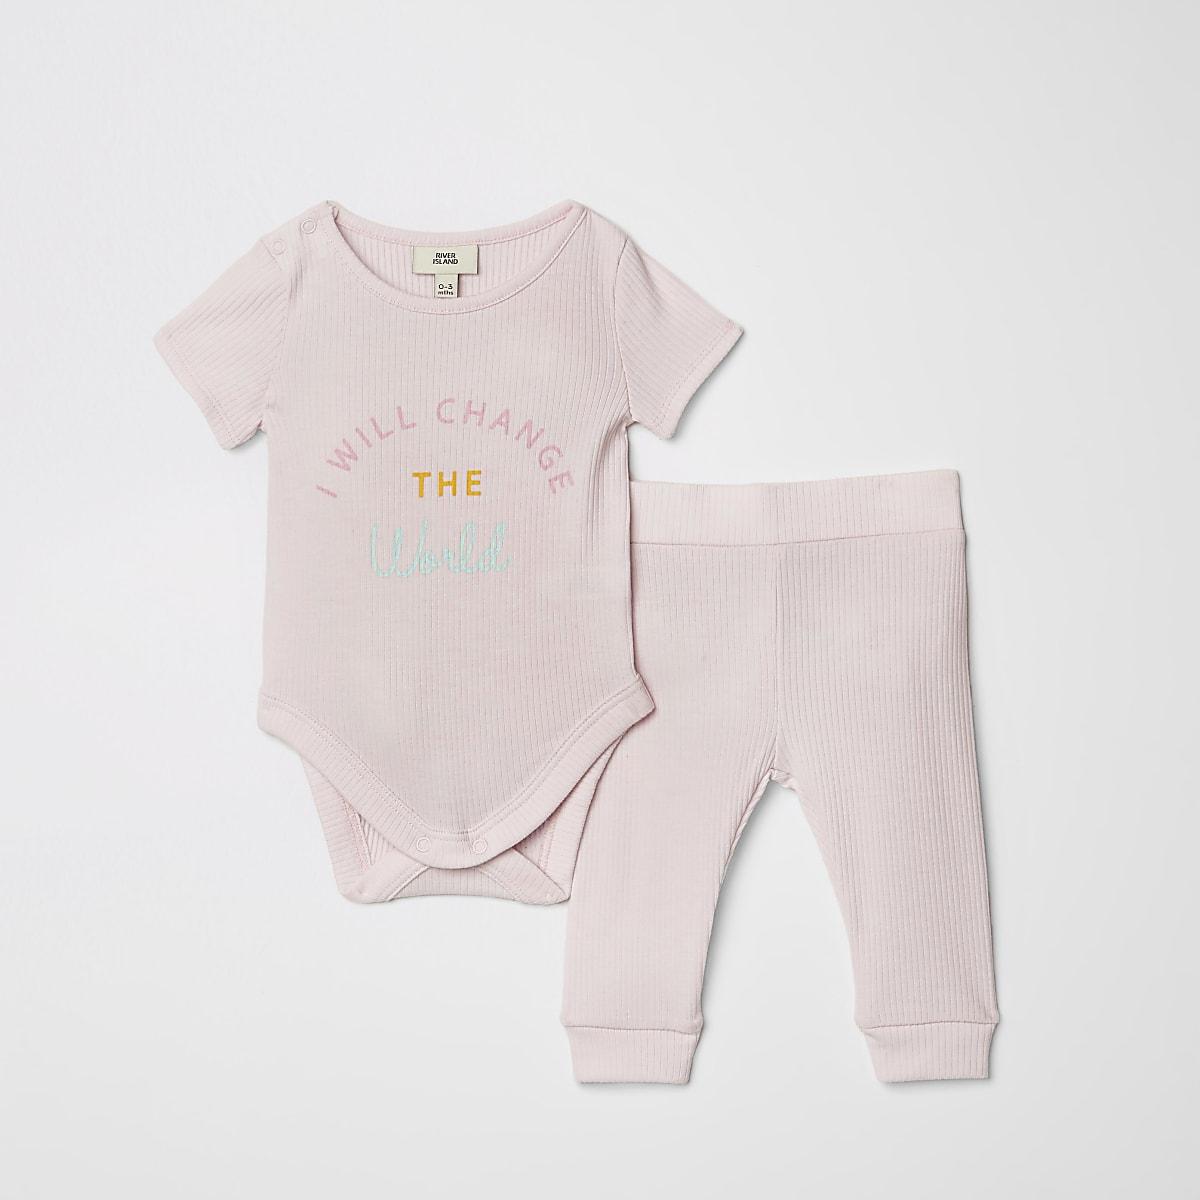 Baby pink slogan print legging outfit